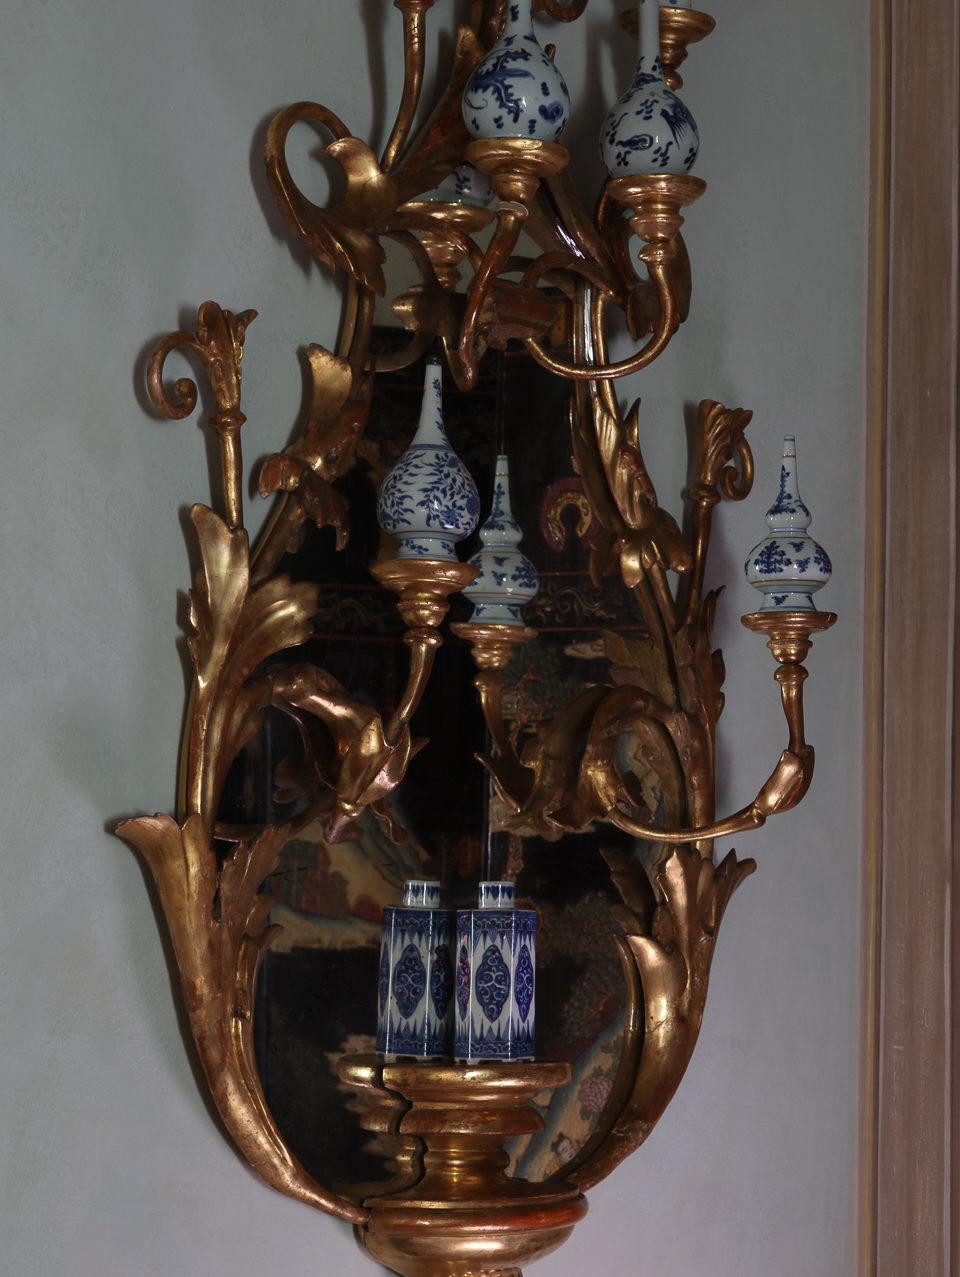 Villa Balbiano luxury property Lake Como Milan best decor decoration 4 floors candelabras antique Chinese porcelain bedroom 17 century availble request